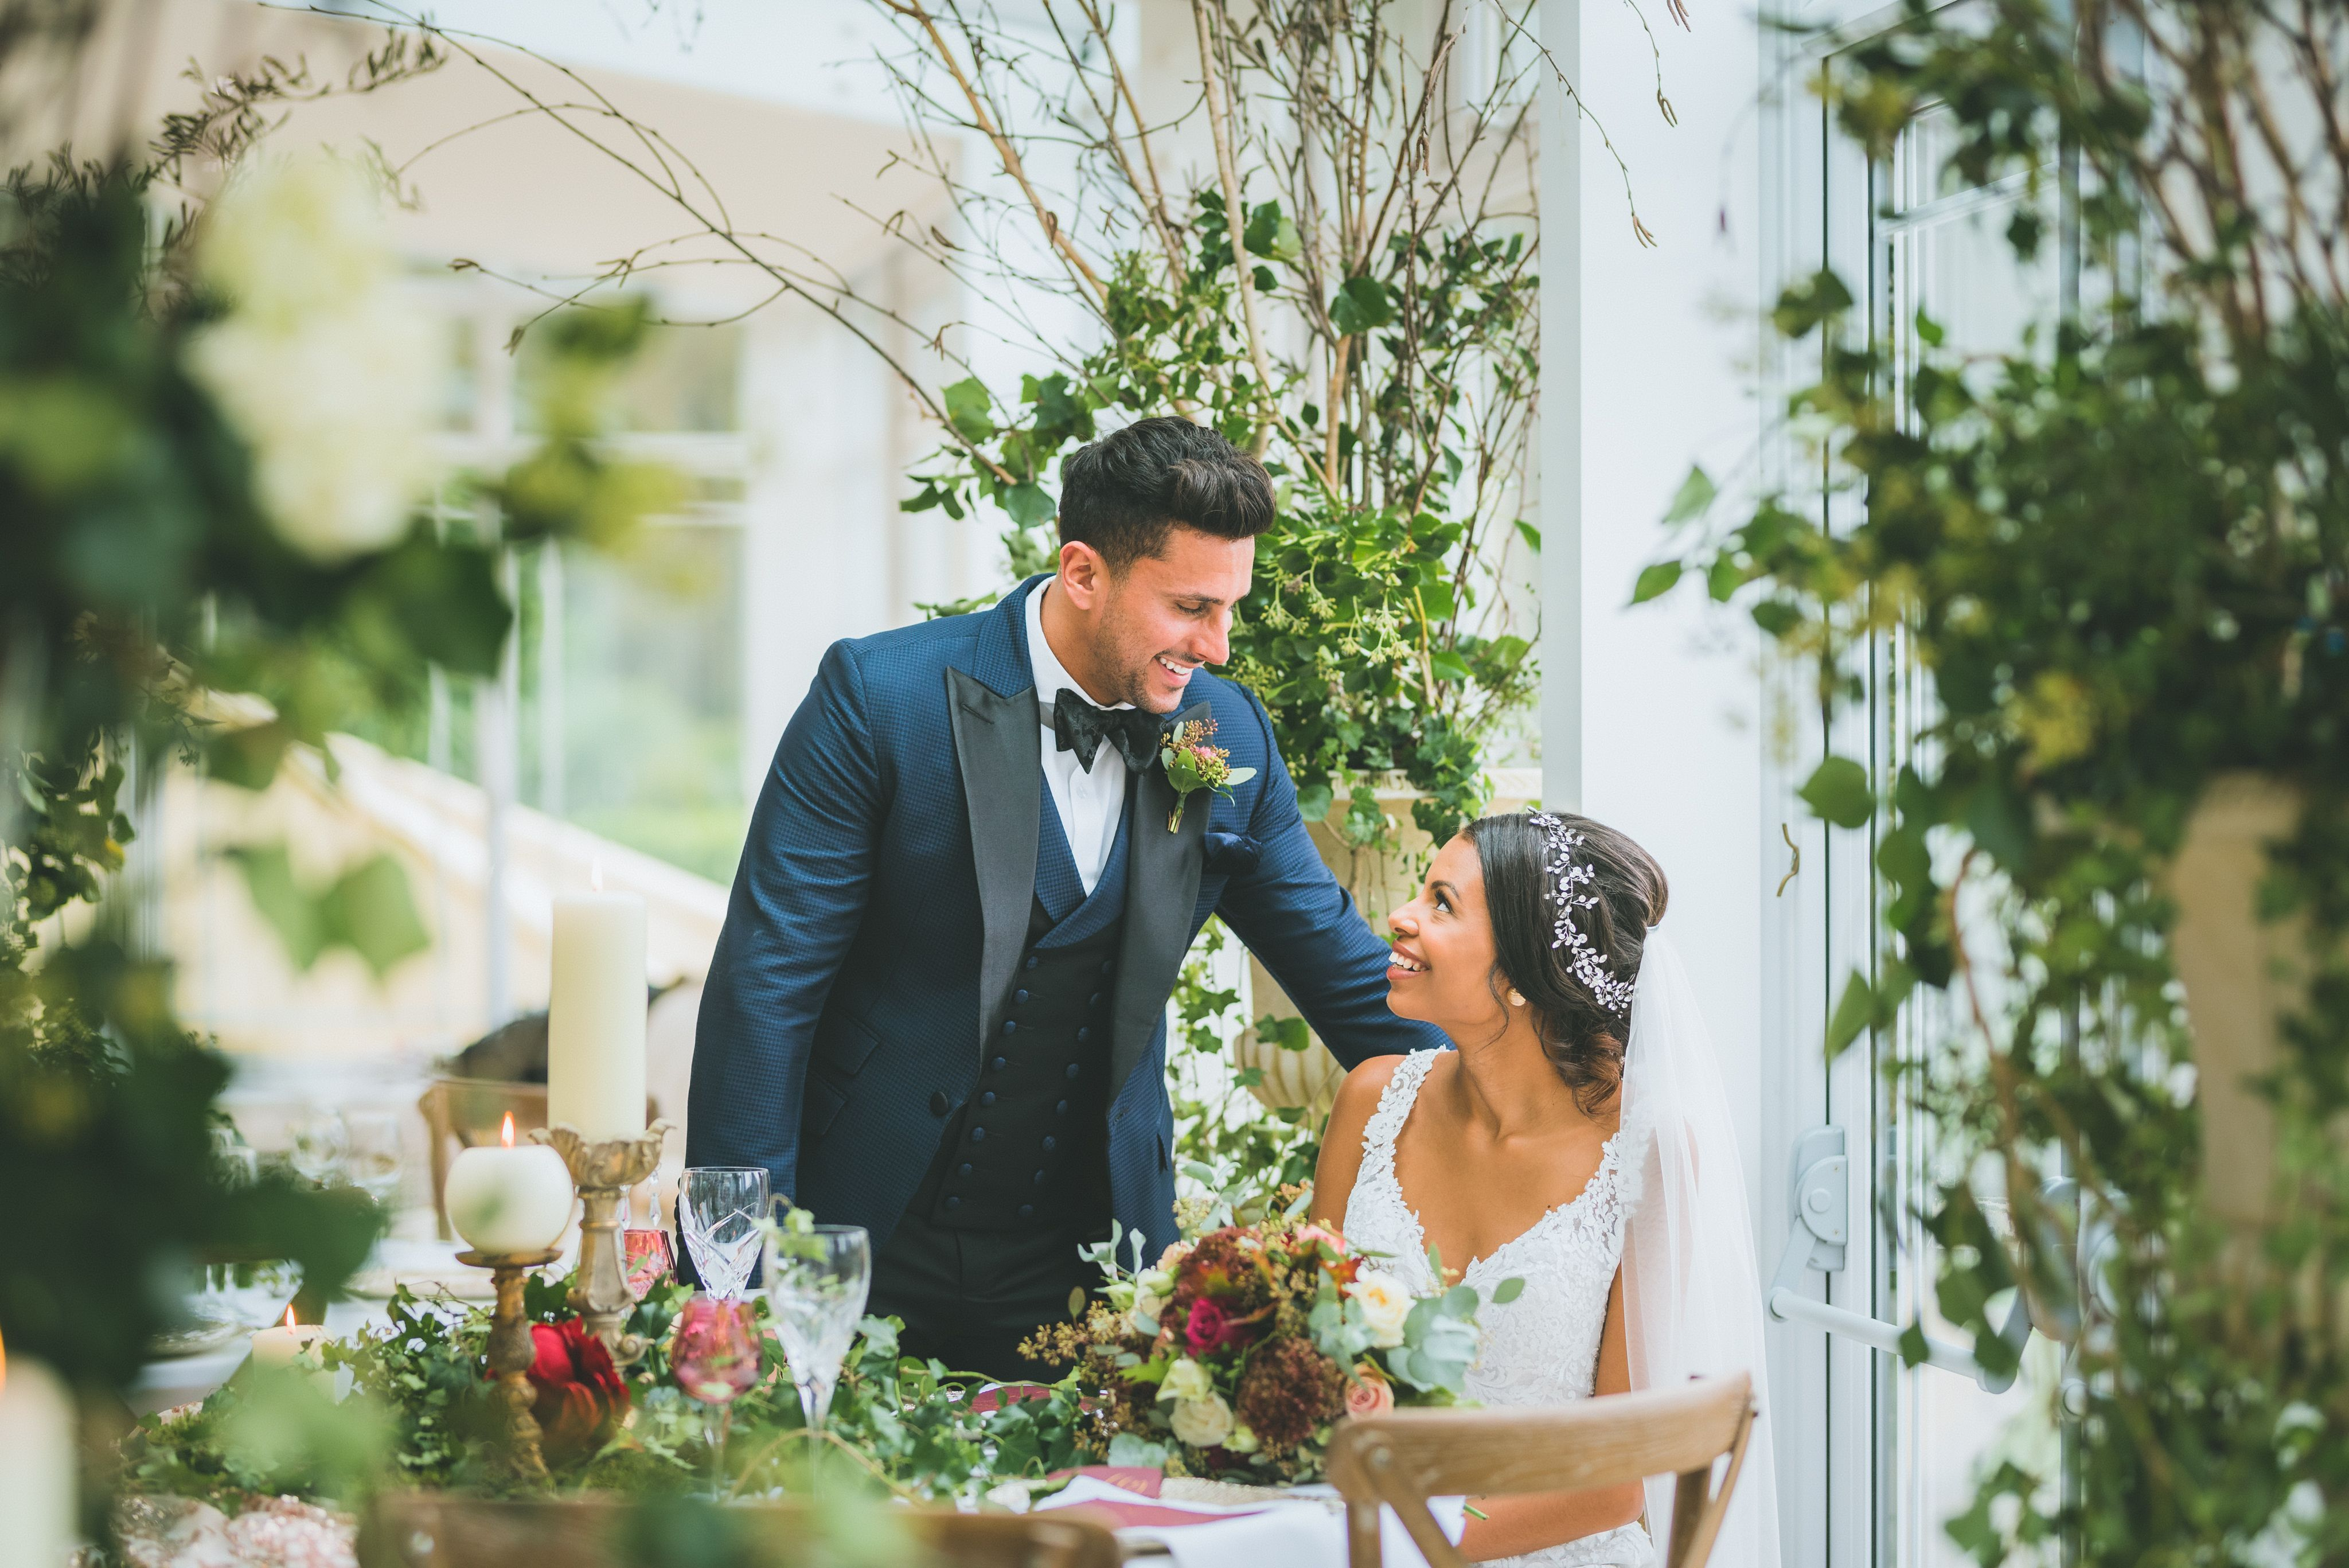 Woodland wedding dress  Woodland Wedding Styled Shoot by Serayah Styling u Event Management